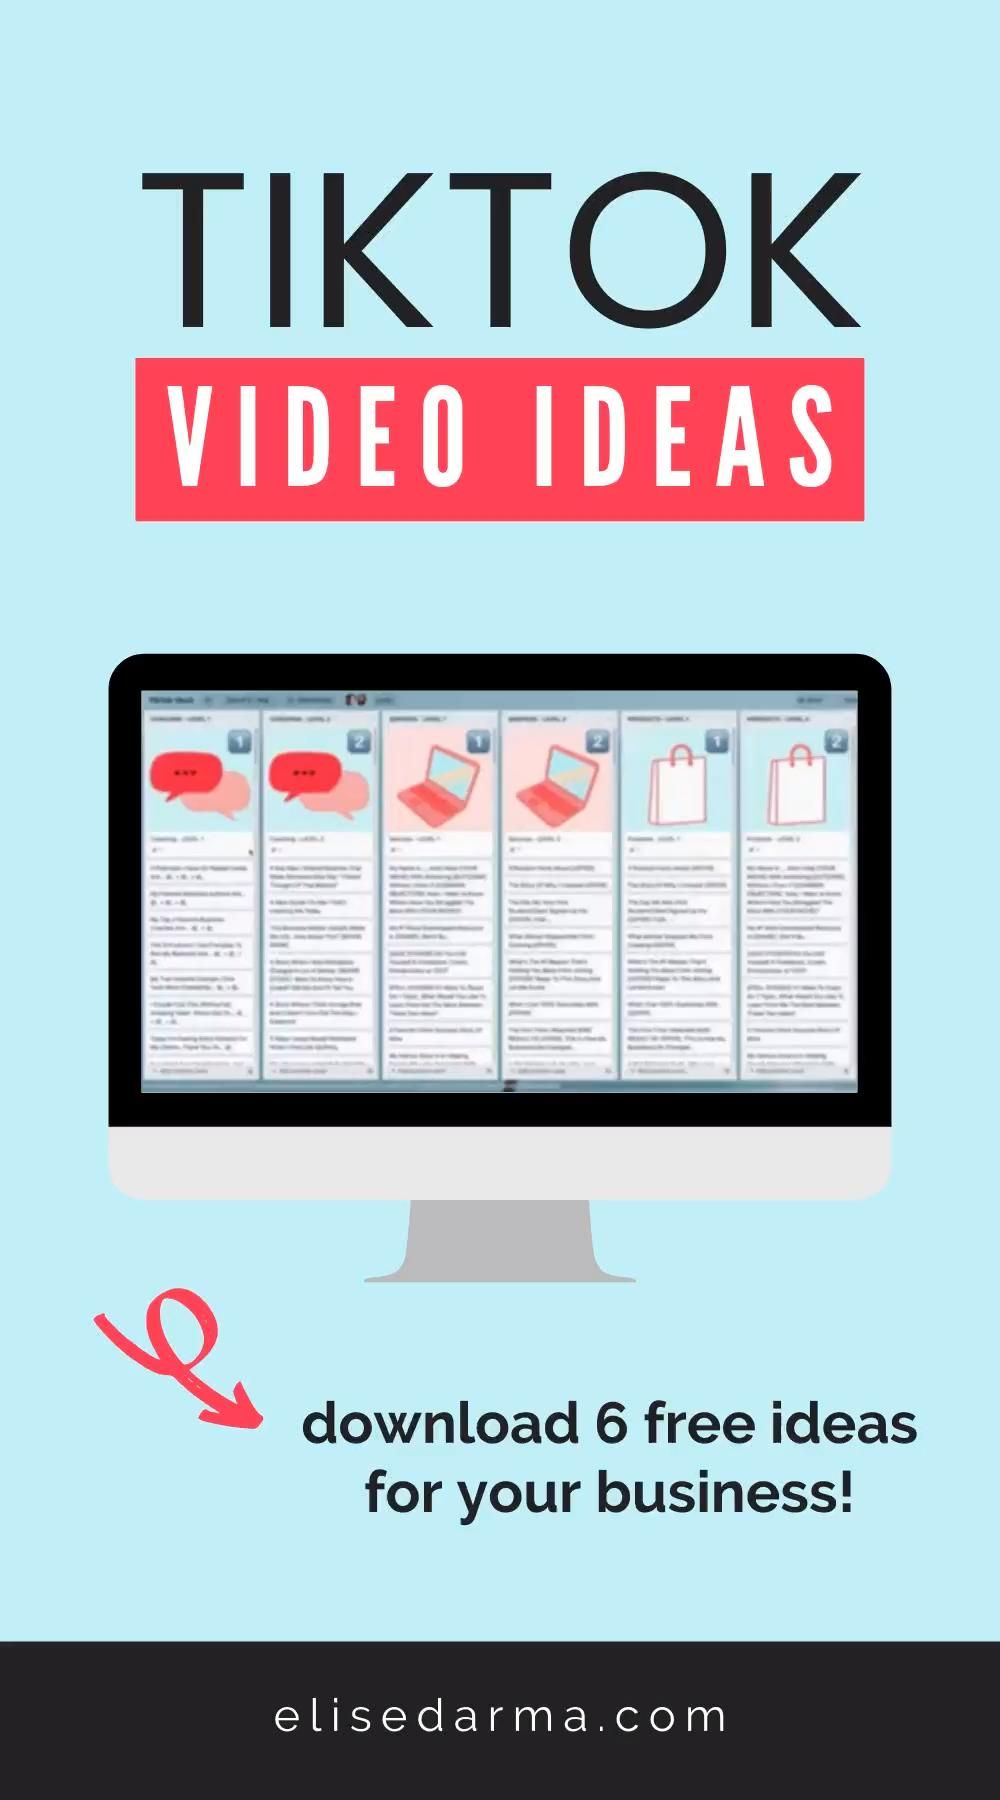 Get 6 Free Tiktok Video Ideas For Your Business Video Social Media Marketing Method Social Media Tool